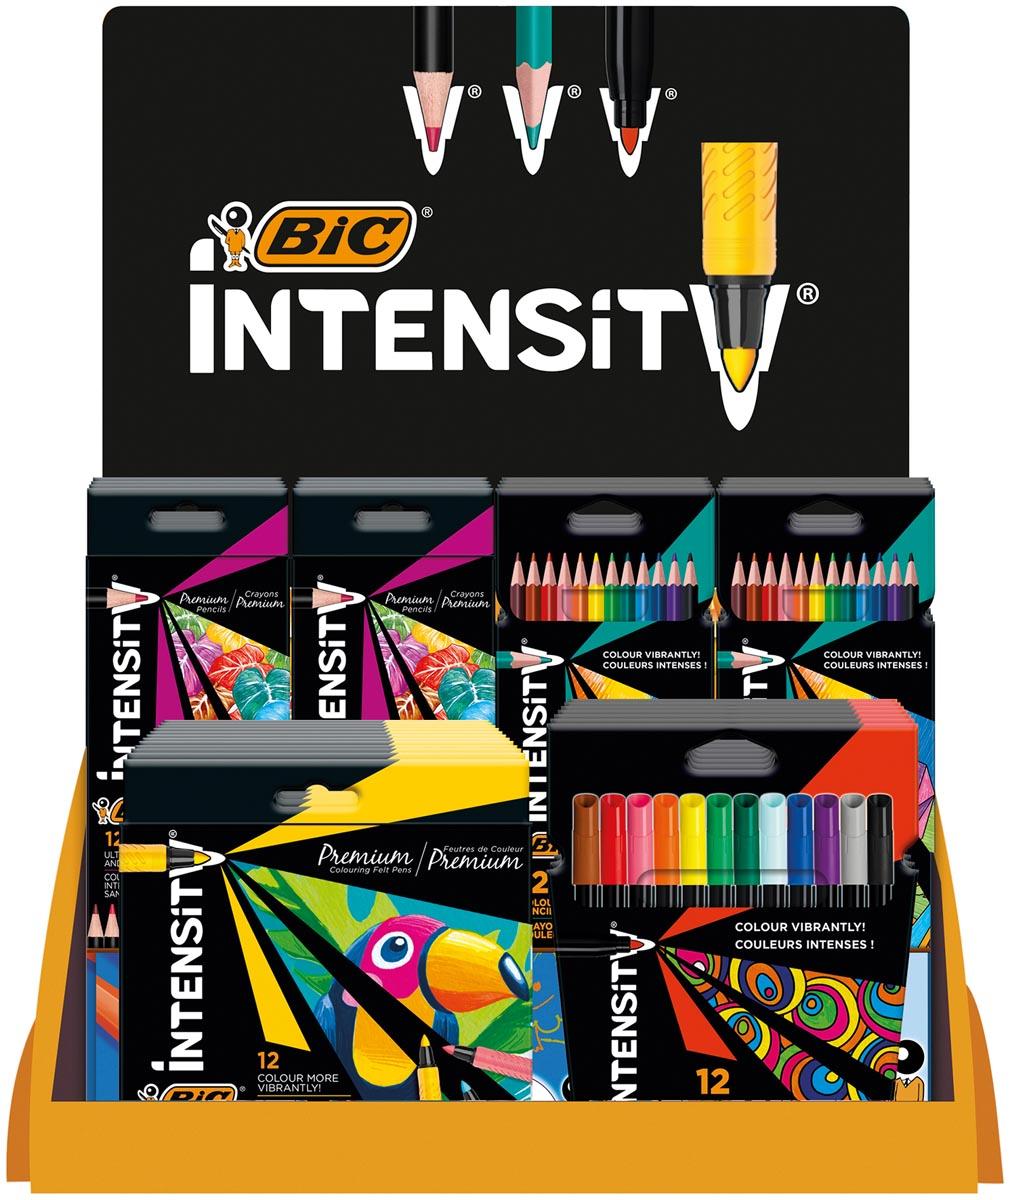 Bic Intensity Coloring, counterdisplay met 35 stuks